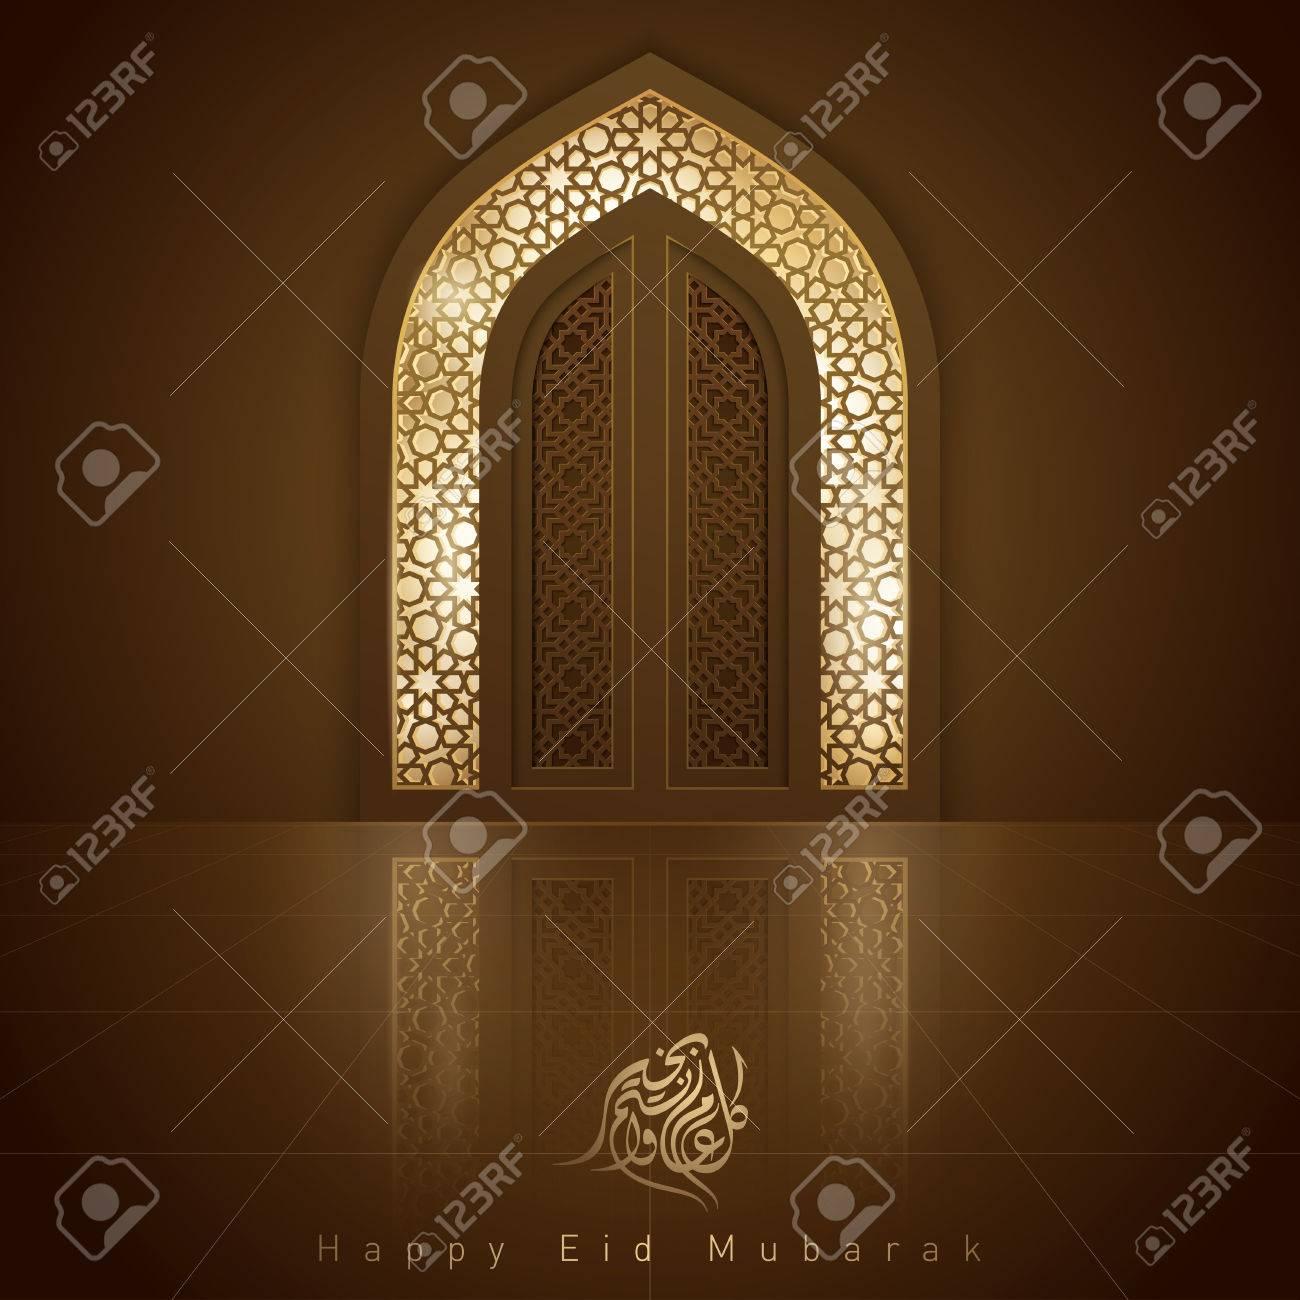 An Islamic Design Mosque Door For Greeting Background Ramadan Kareem Stock  Vector   77746185